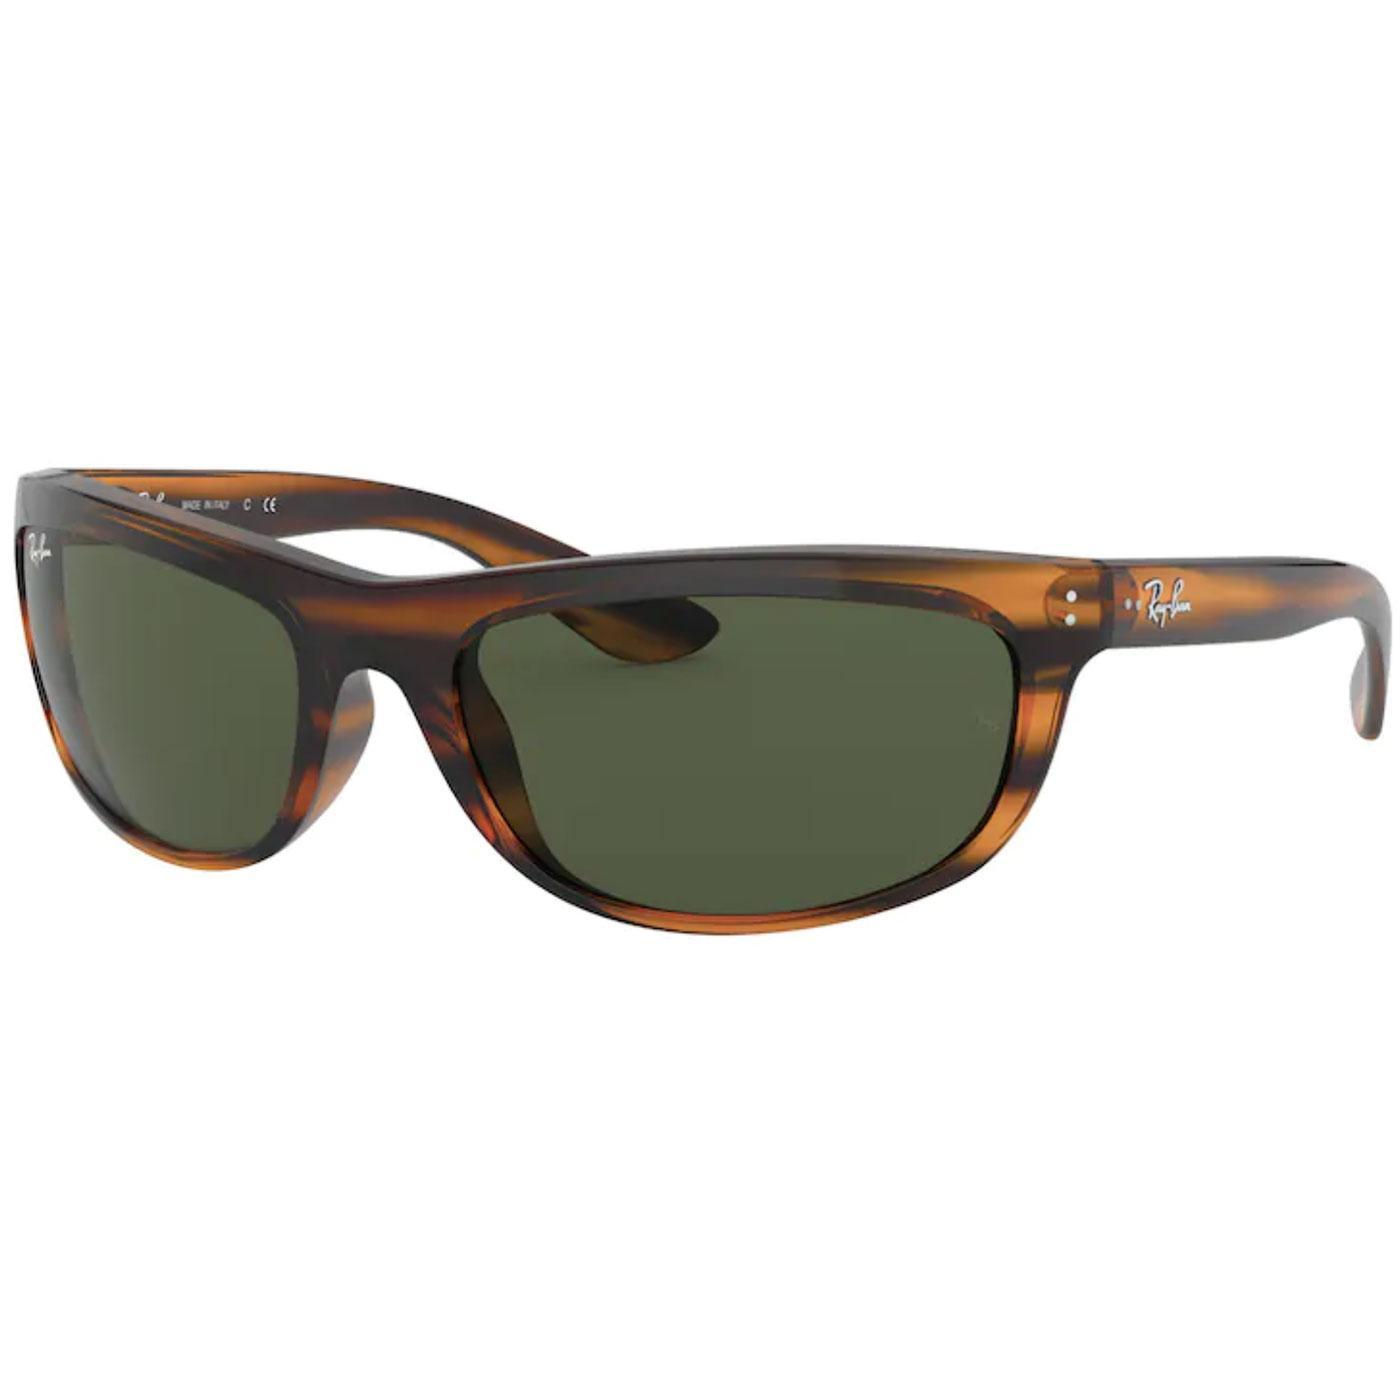 Balorama RAY-BAN Retro Wrap Round Sunglasses (SRH)